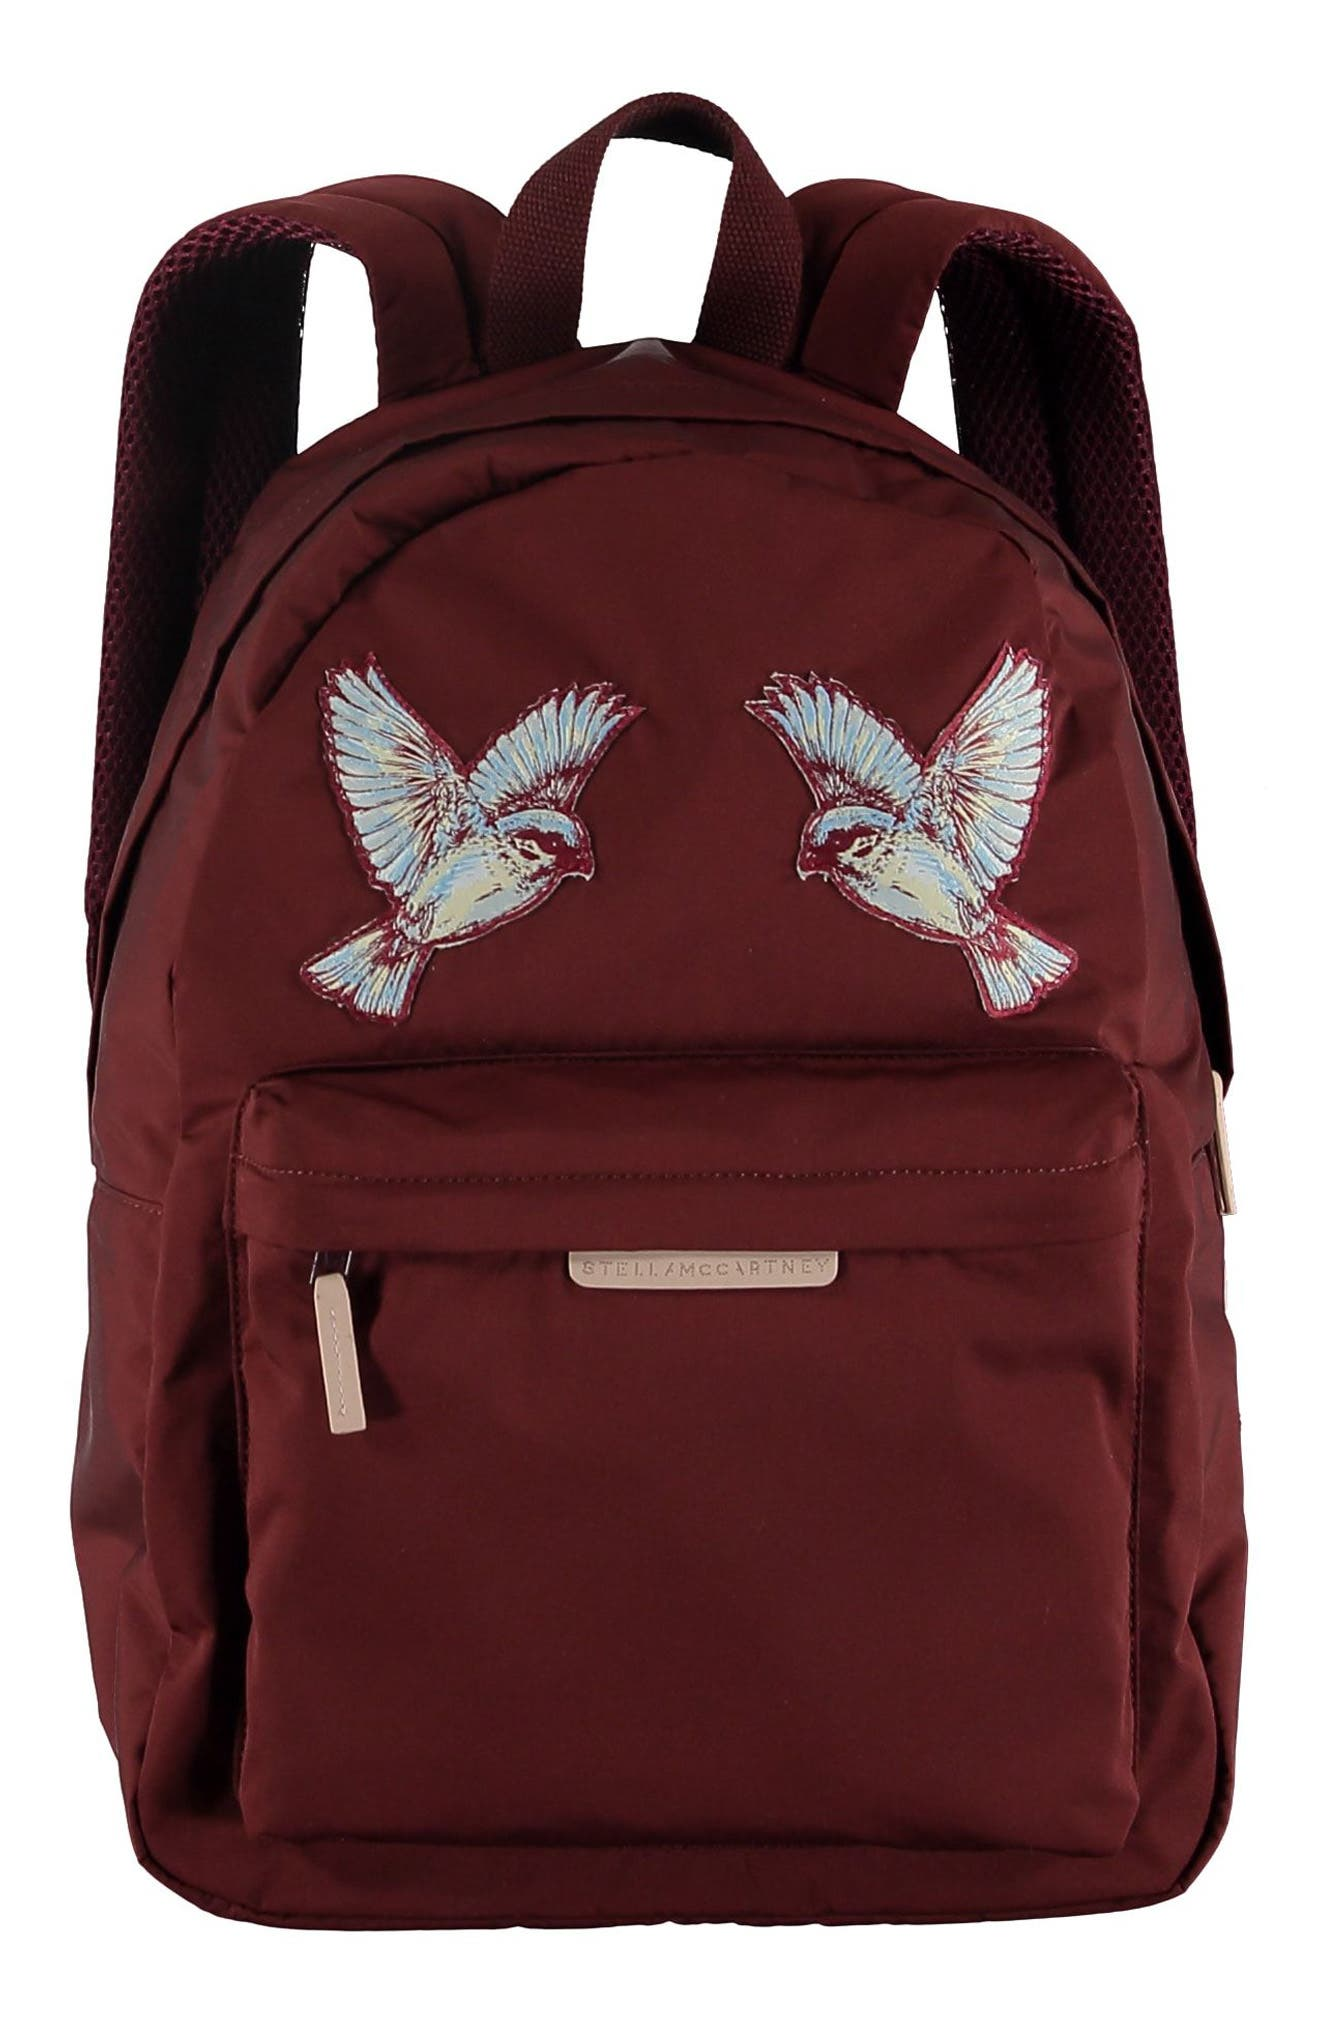 Hummingbird Appliqué Backpack,                             Main thumbnail 1, color,                             BURGUNDY